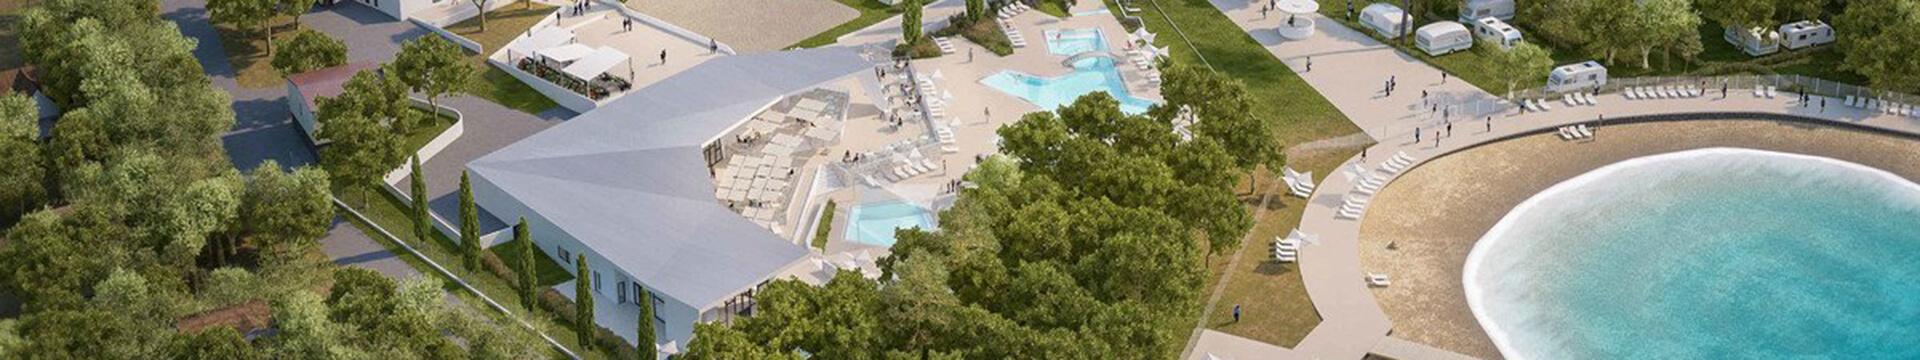 Prvi kamp s 5* u Dalmaciji – Falkensteiner Premium Camping Zadar